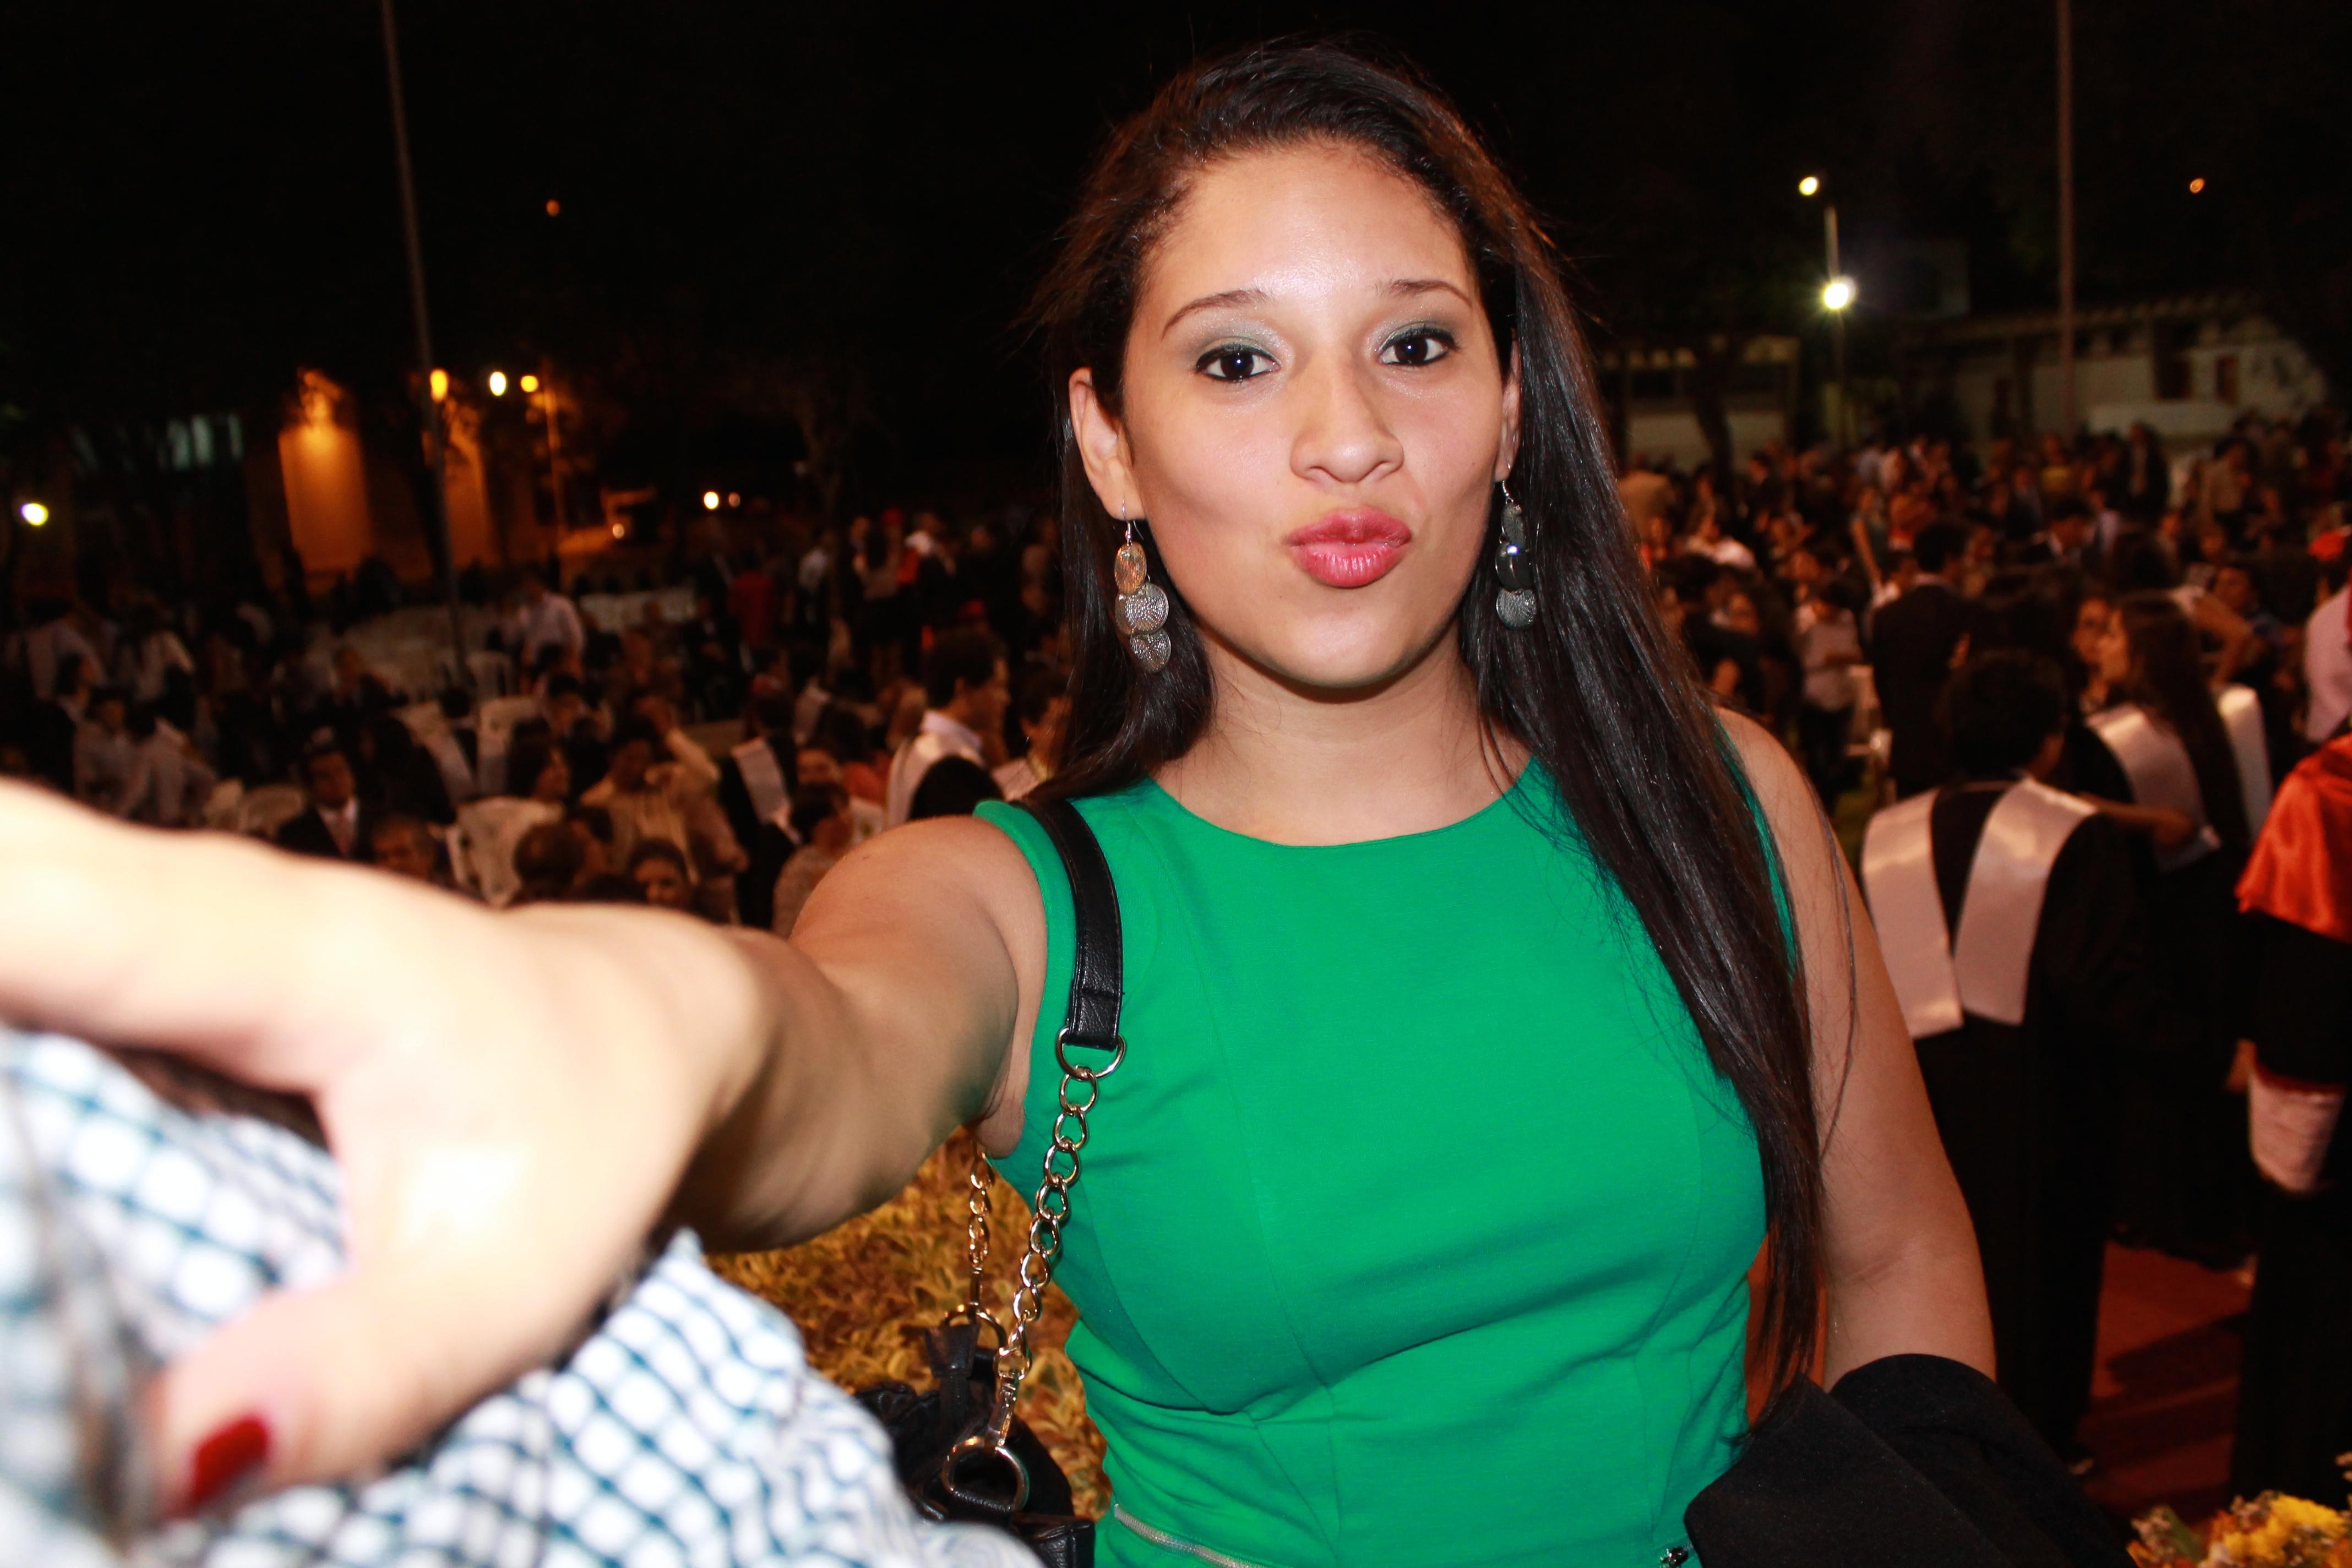 Chica con vestido verde - 4272x2848